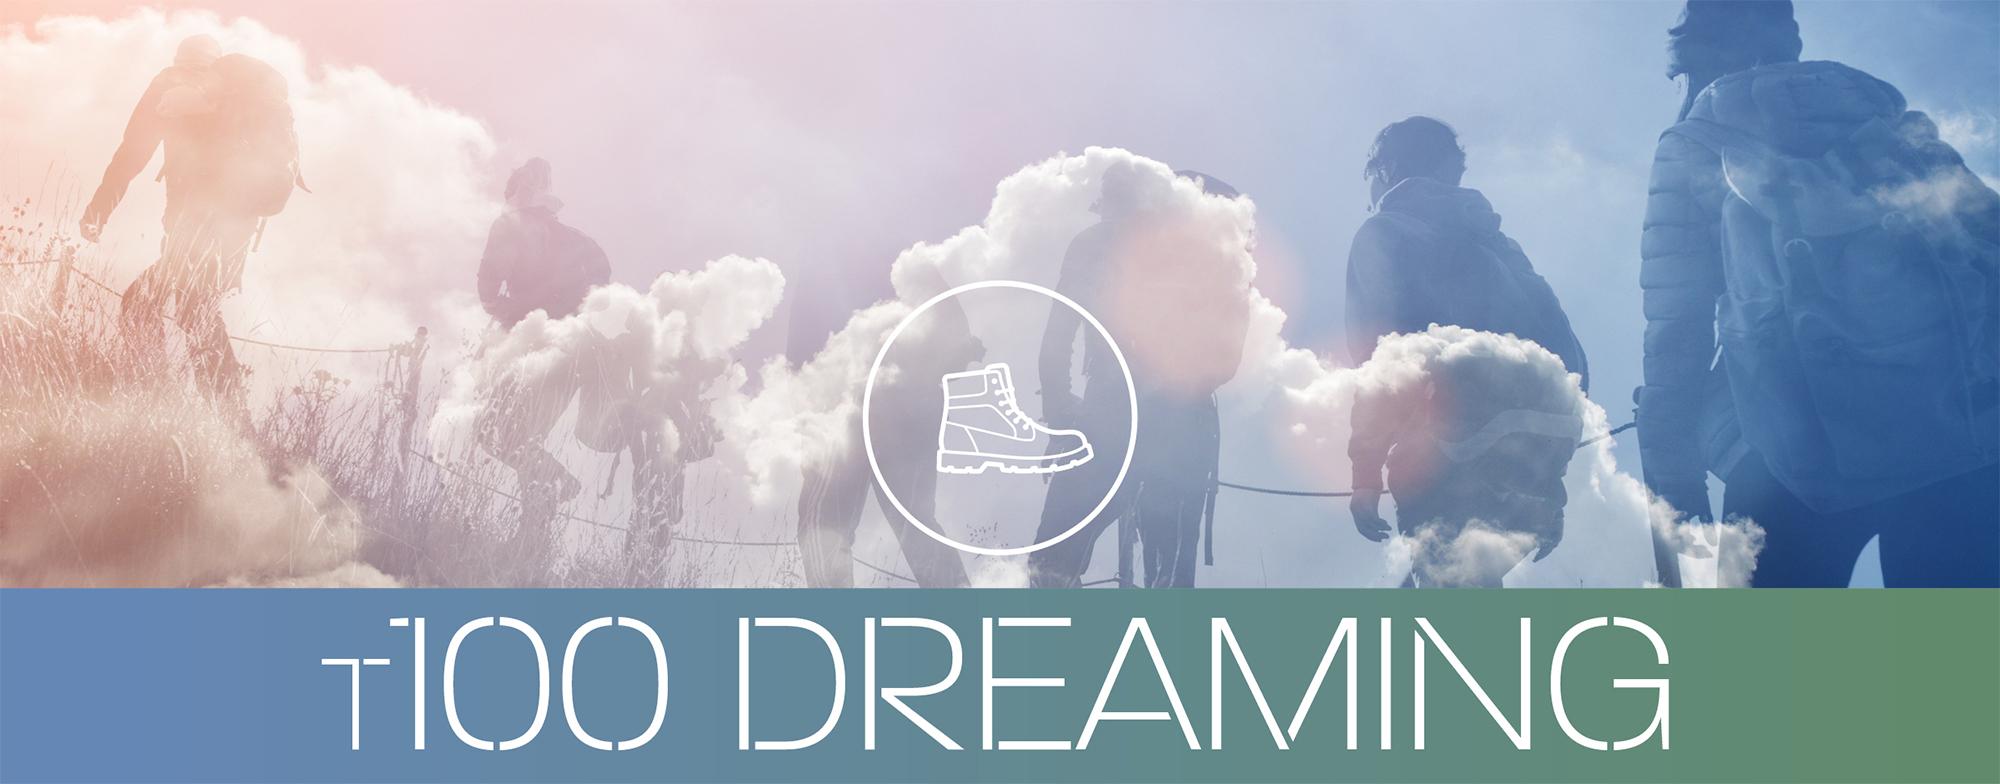 T100 Dreaming header image